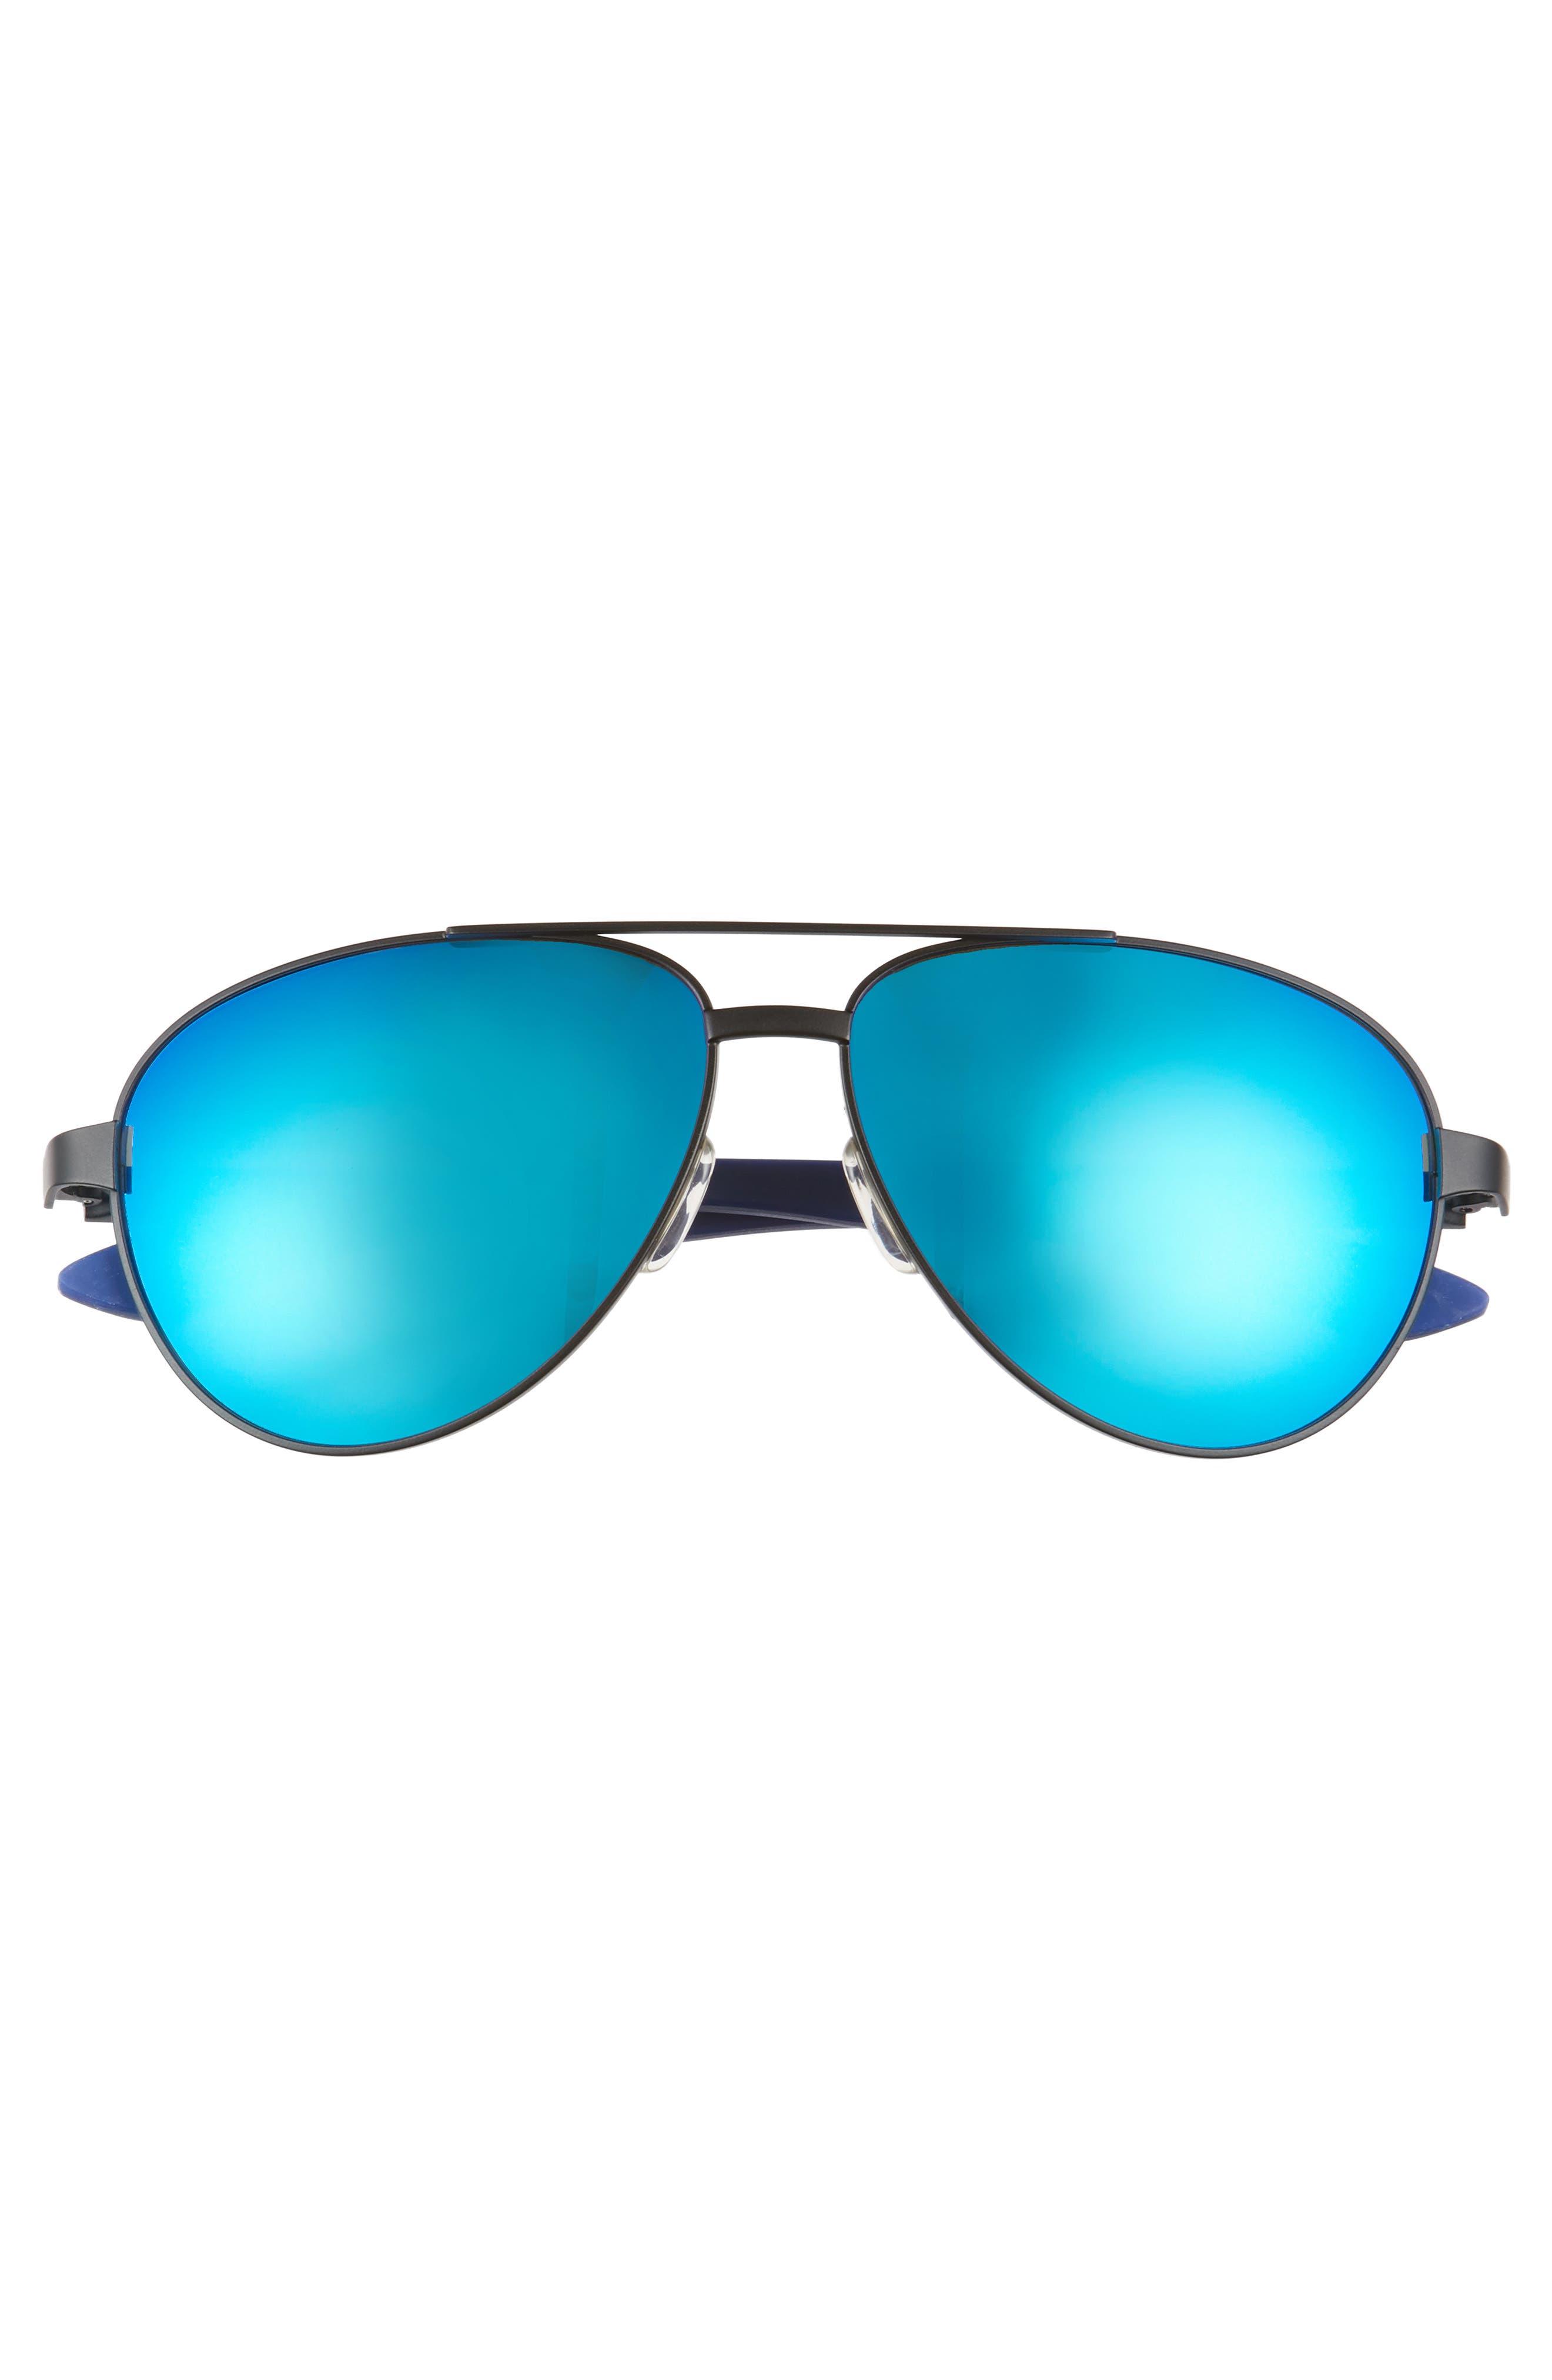 Salute 59mm Aviator Sunglasses,                             Alternate thumbnail 3, color,                             001